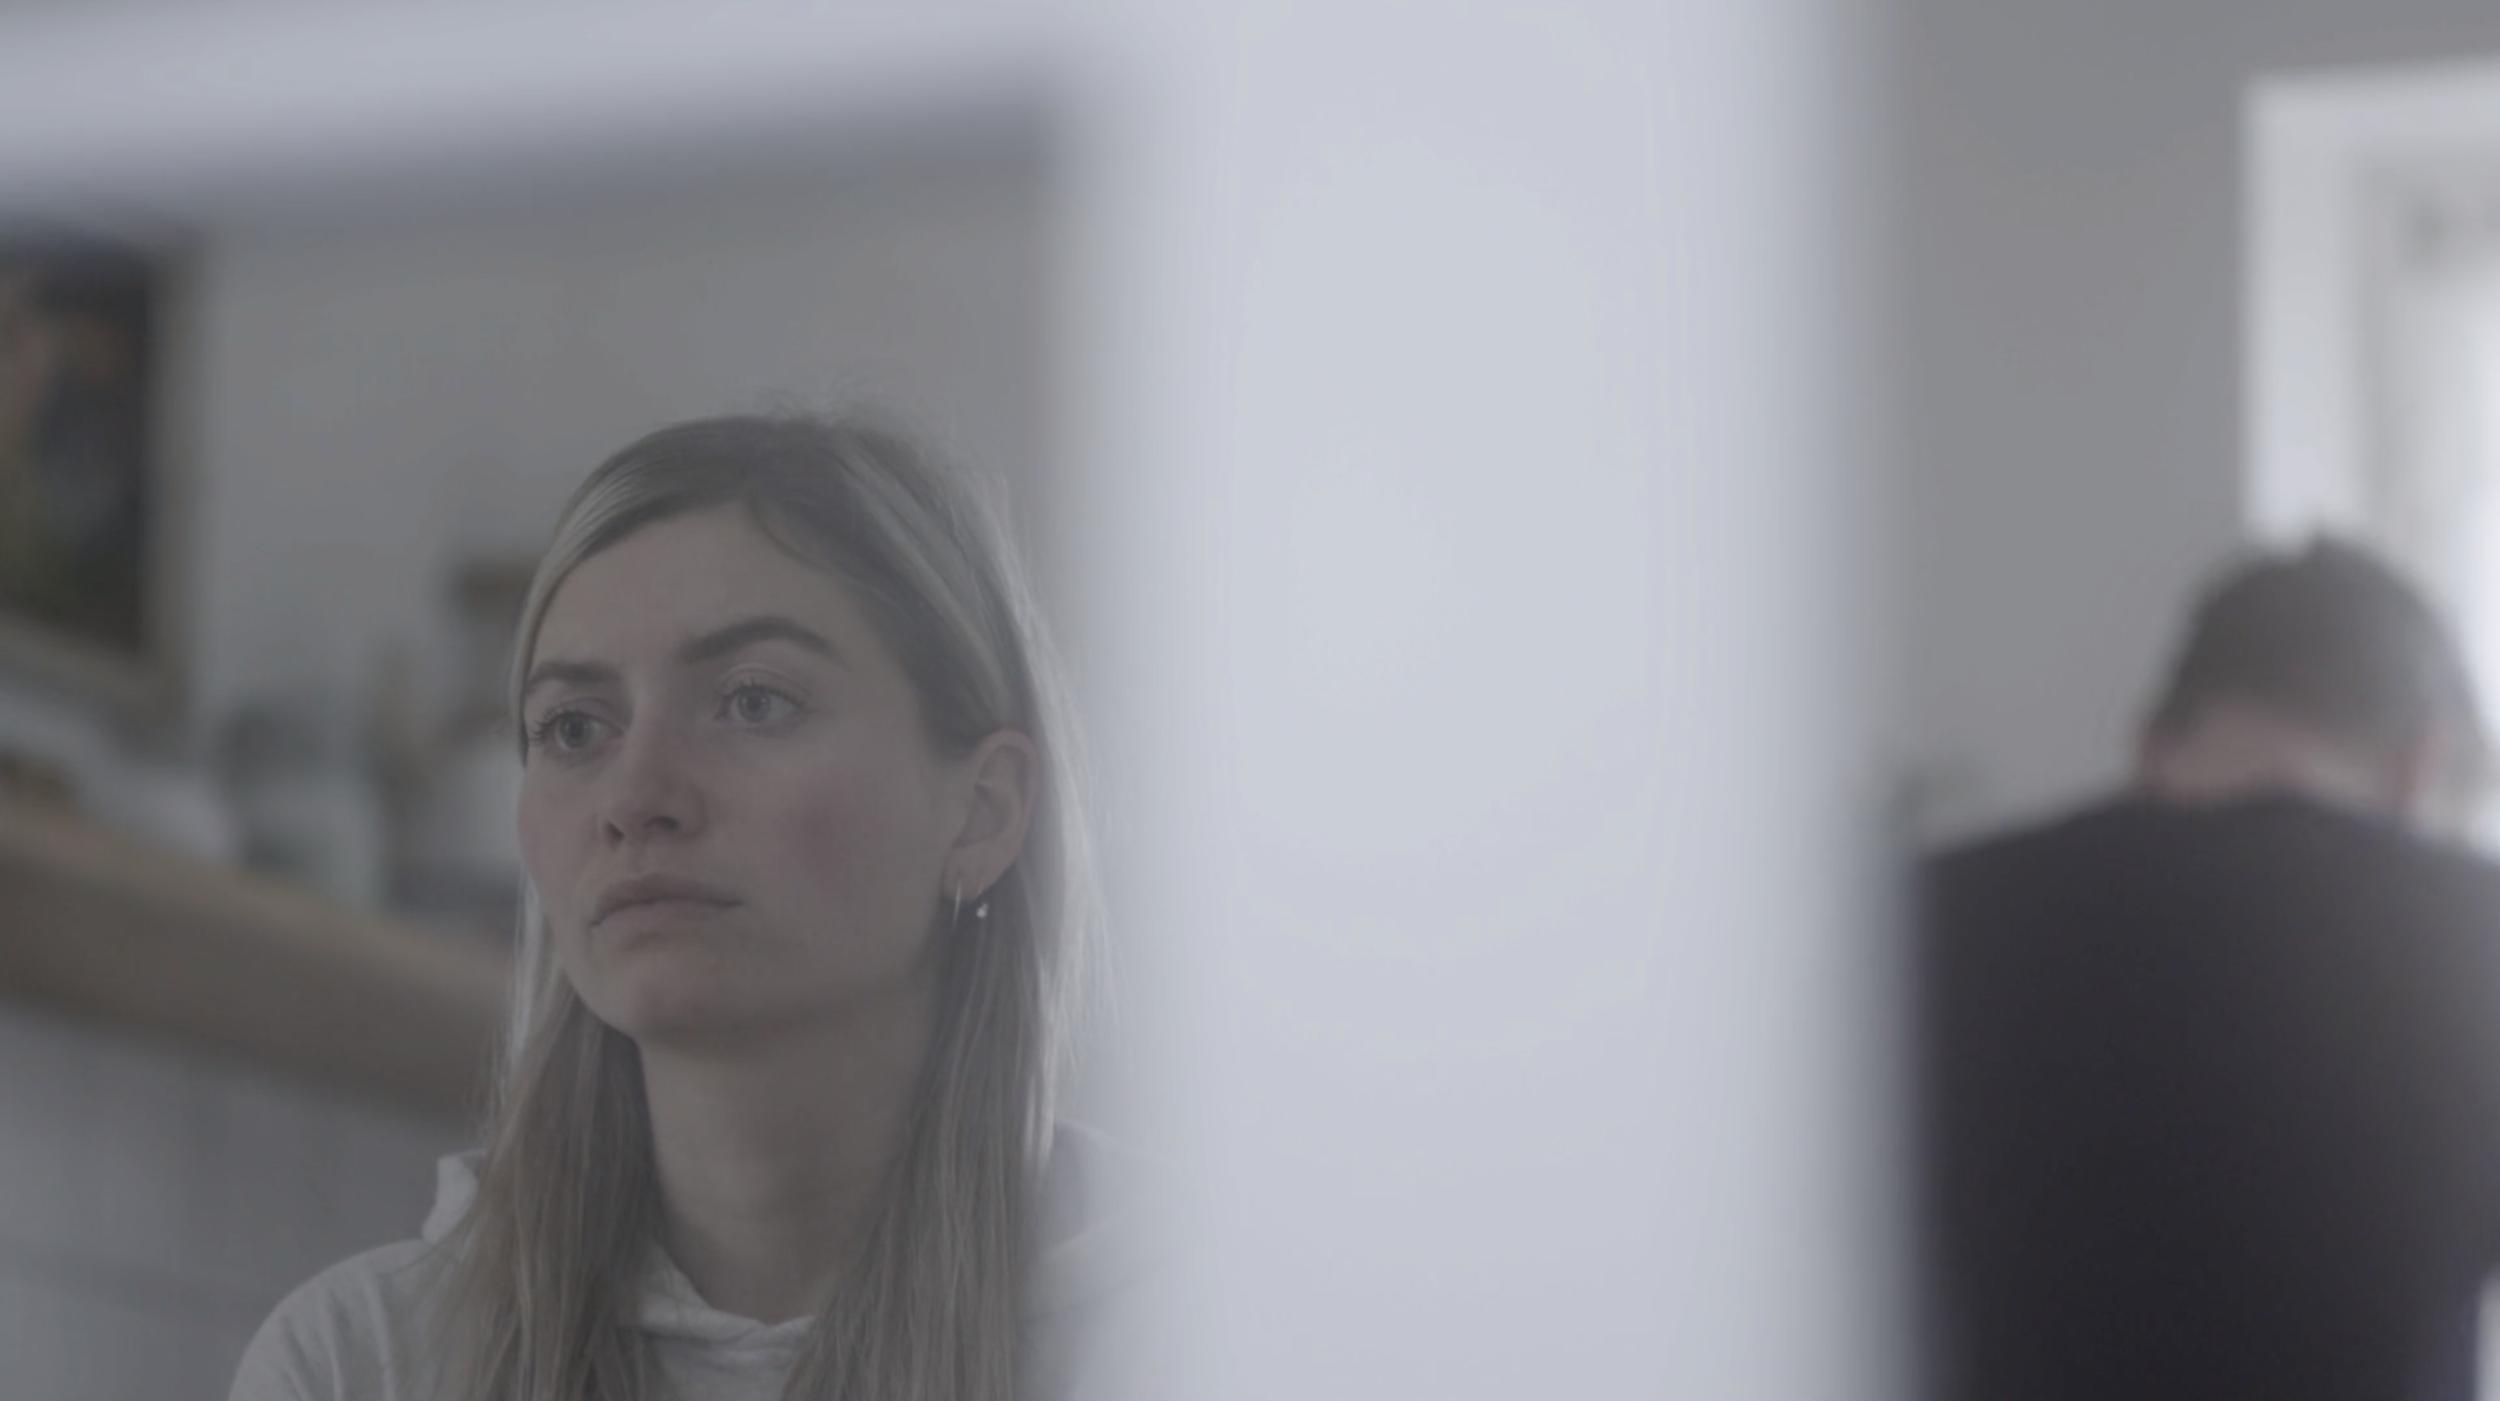 TOMORROW - SHORT FILMDIRECTOR SIMON MØLVIG